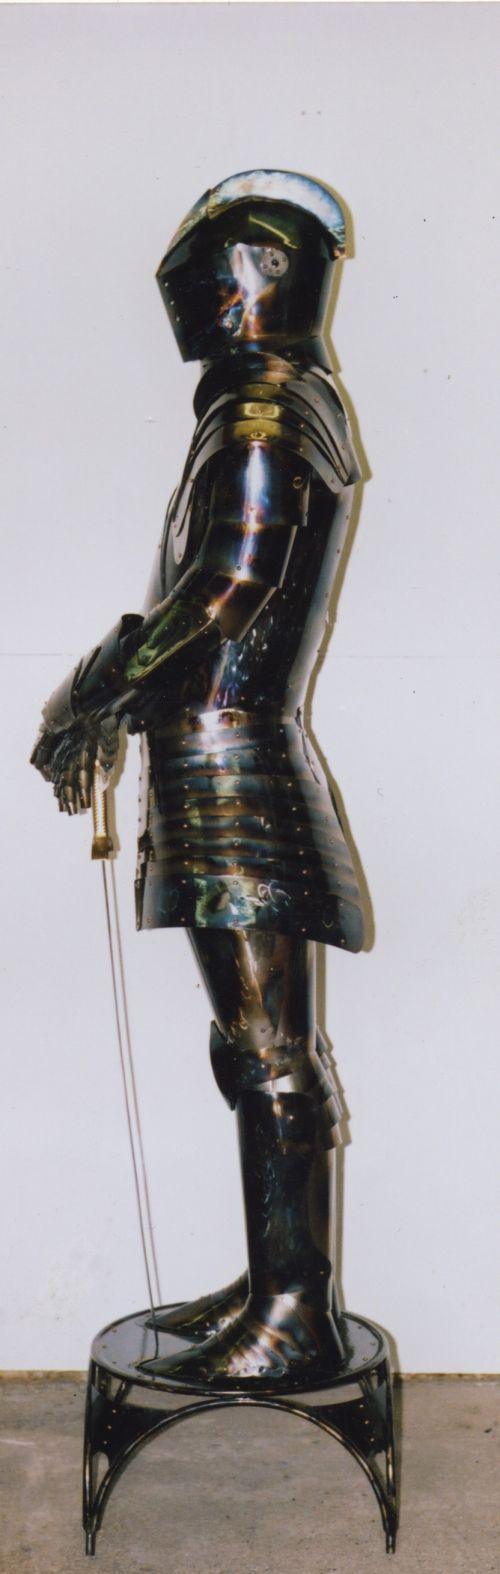 #Steel #sculpture by #sculptor John Douglas Joyce titled: 'Knight (Contemporary Modern Realistic Steel Armour statue sculpture)'. #JohnDouglasJoyce